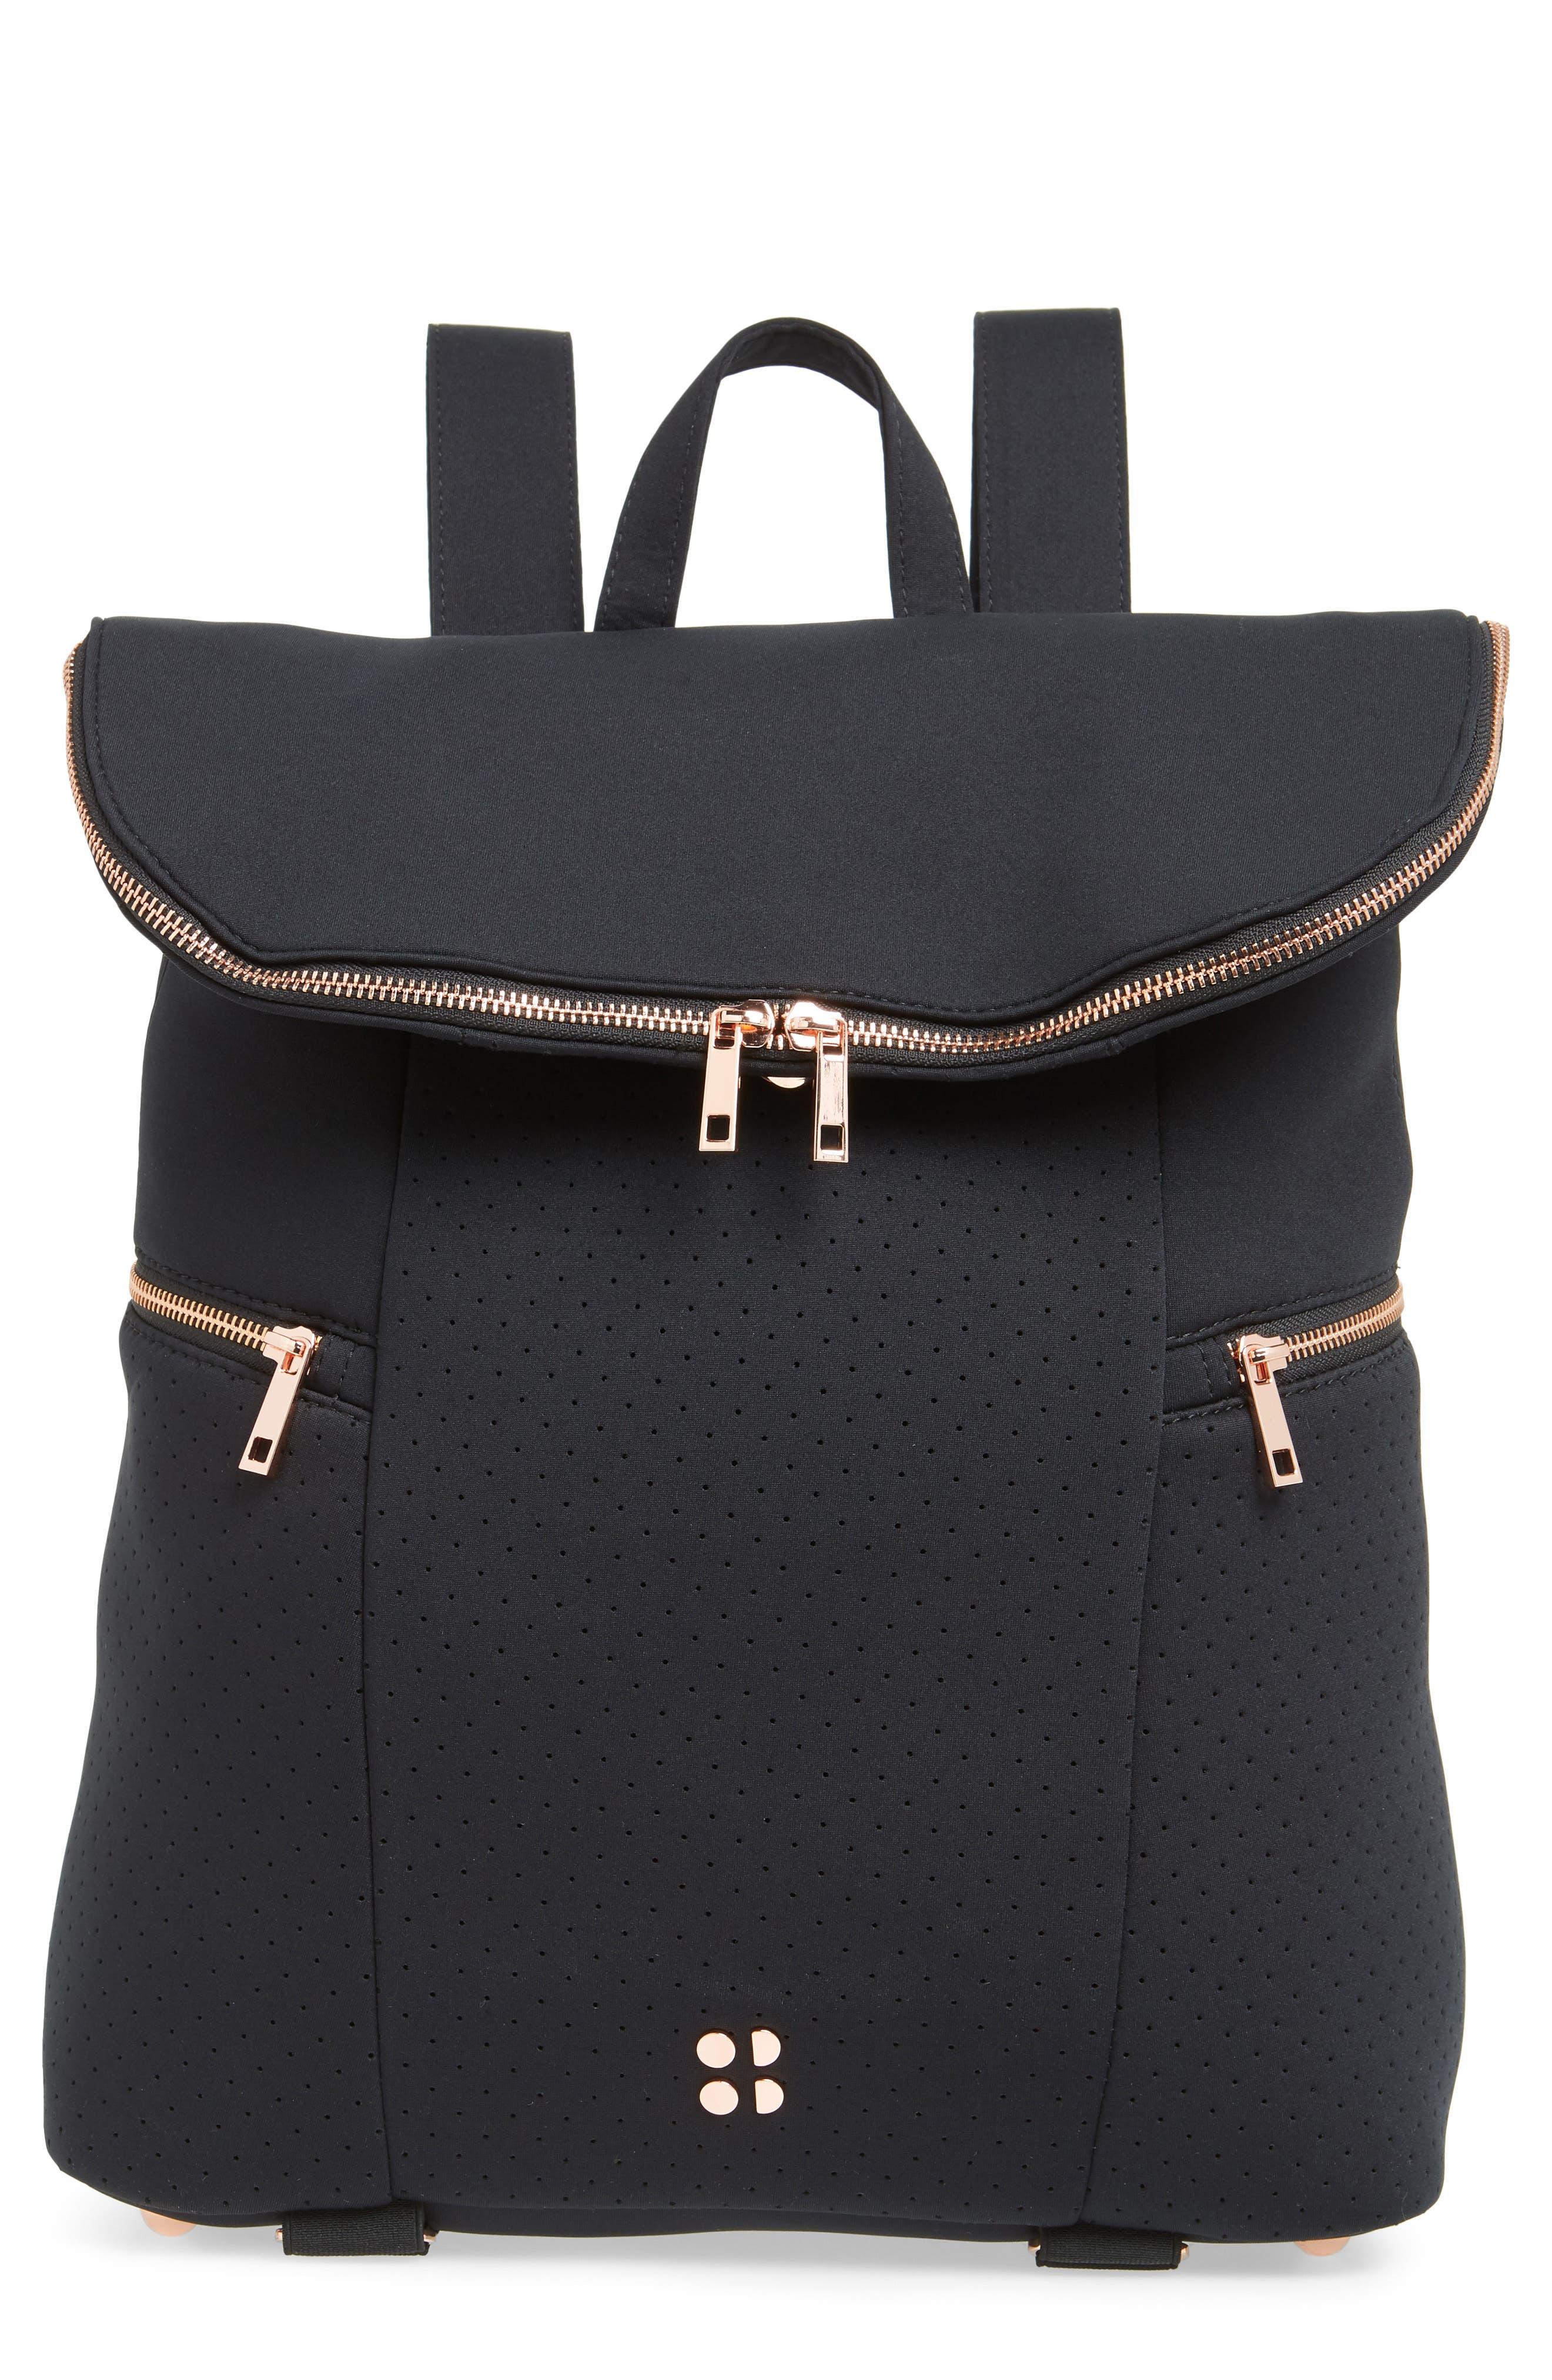 All Sport Backpack,                         Main,                         color, Black